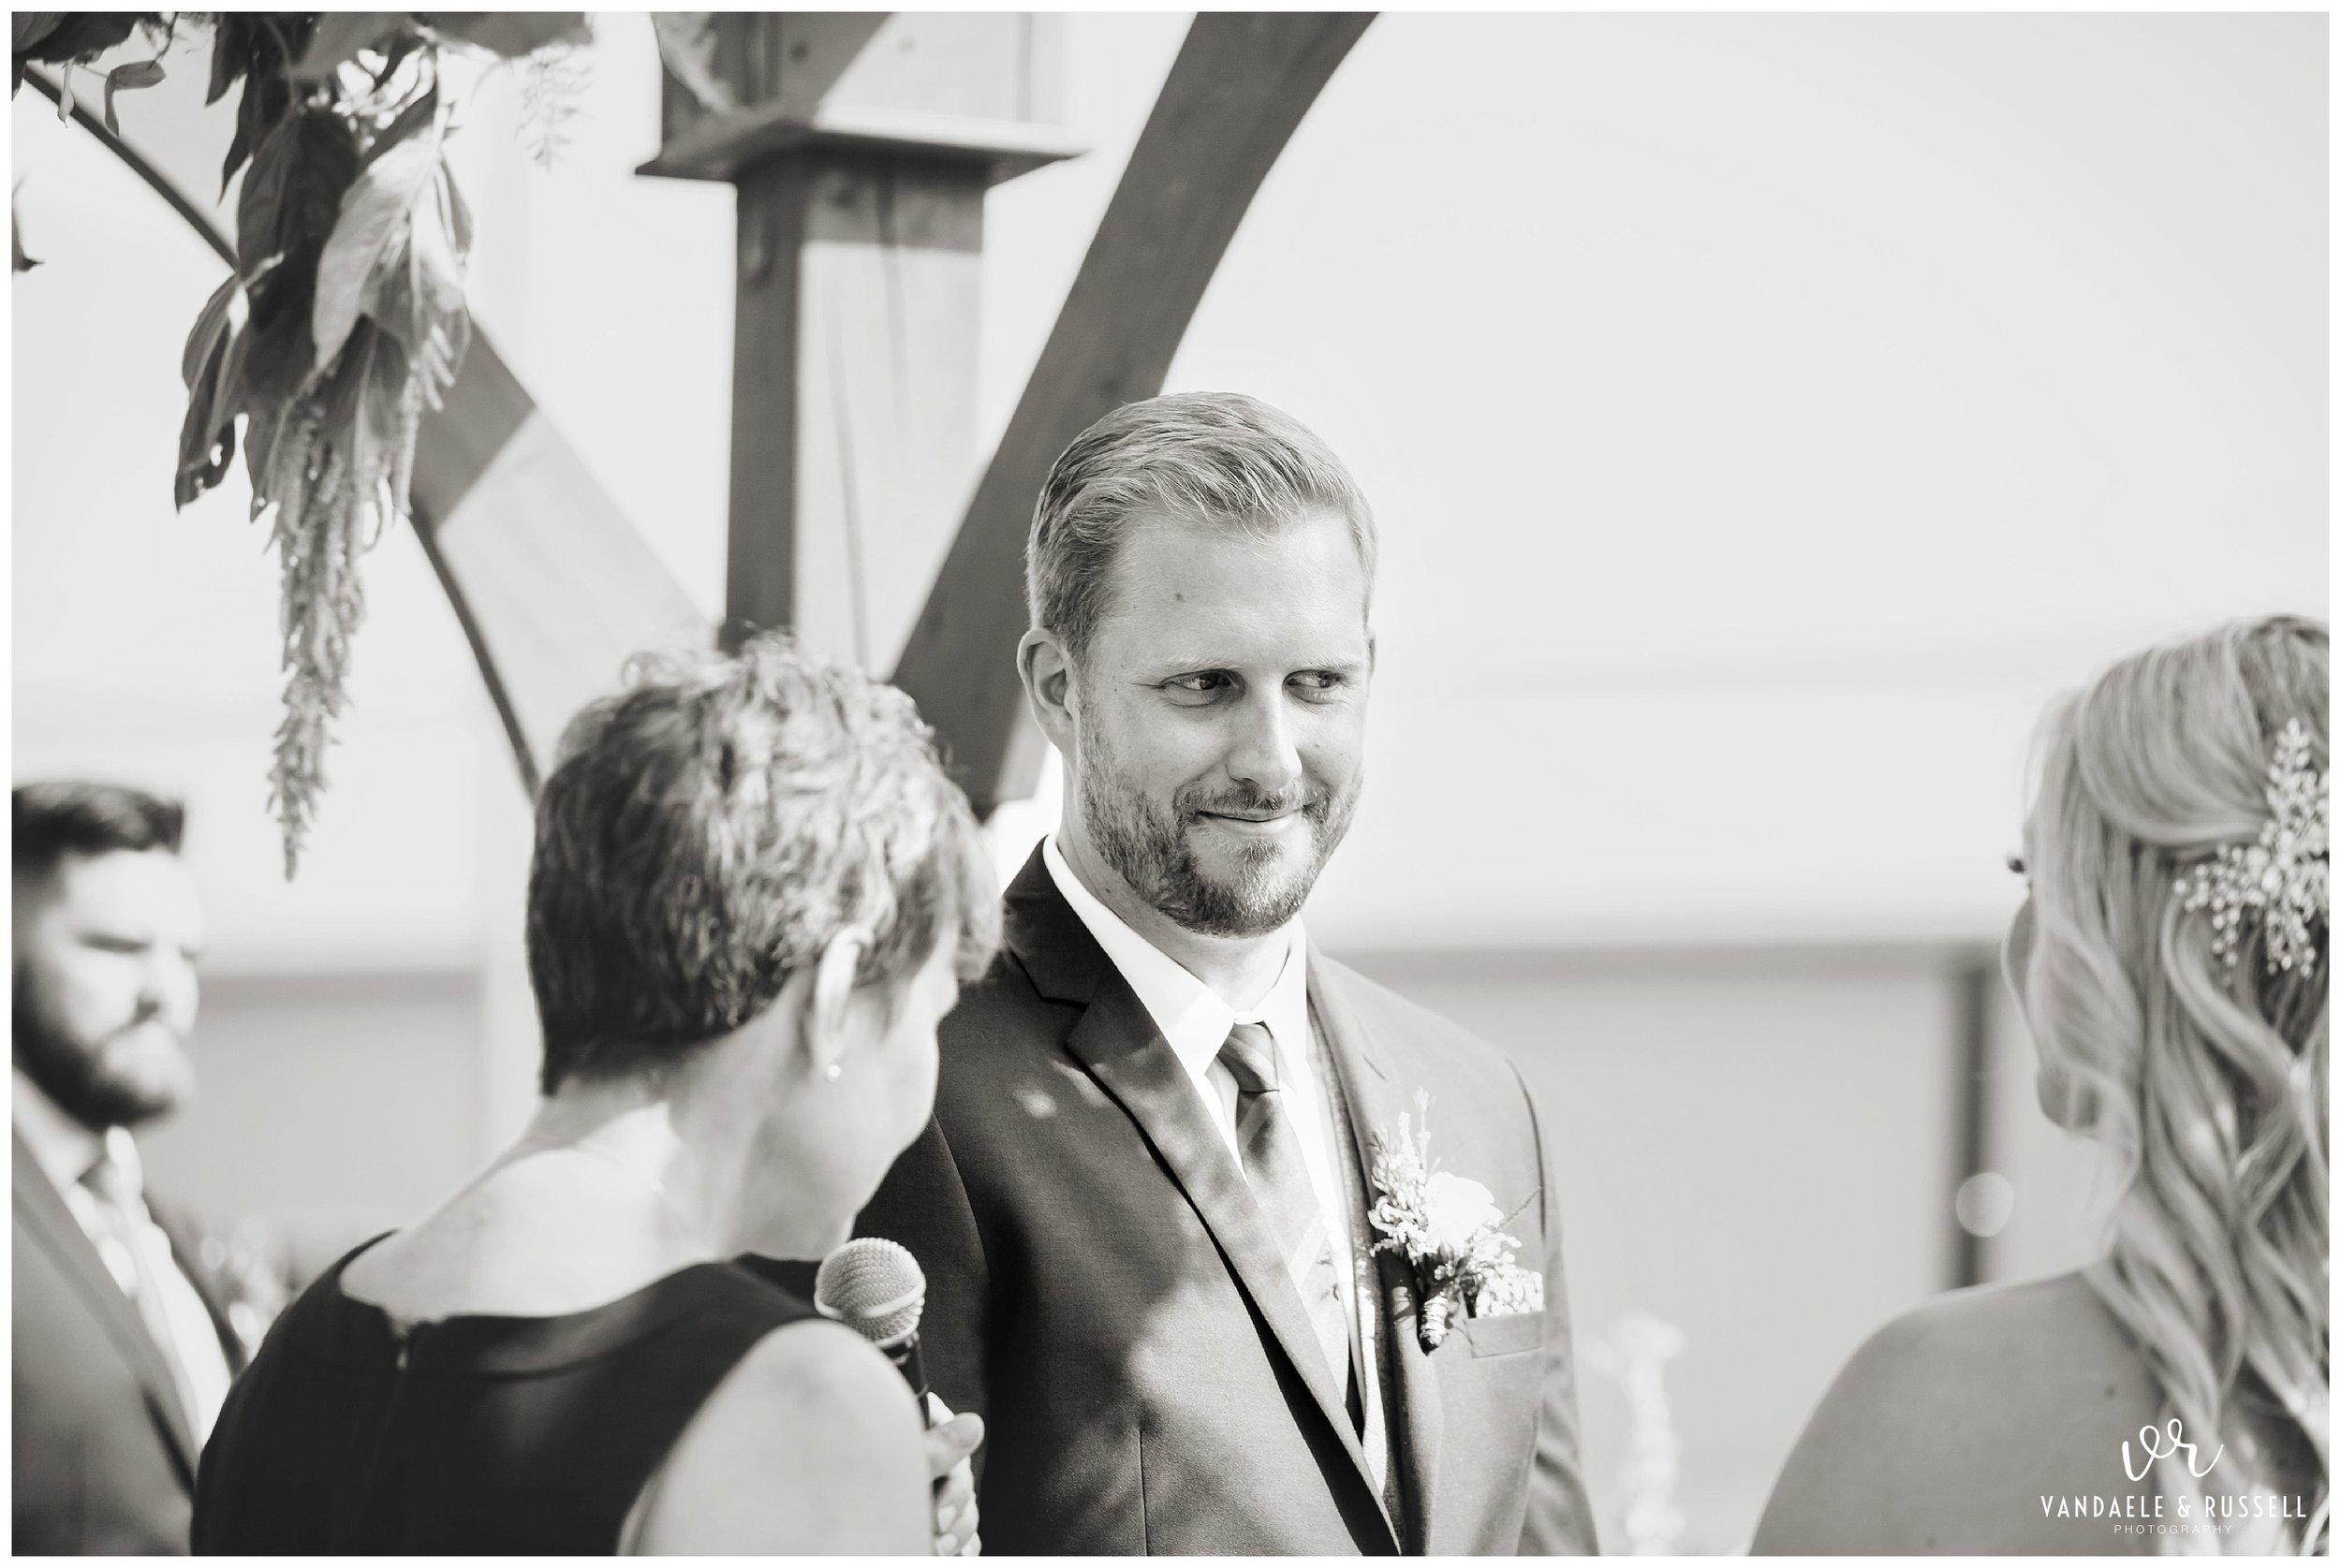 VanDaele-Russell-Wedding-Photography-London-Toronto-Ontario_0186.jpg